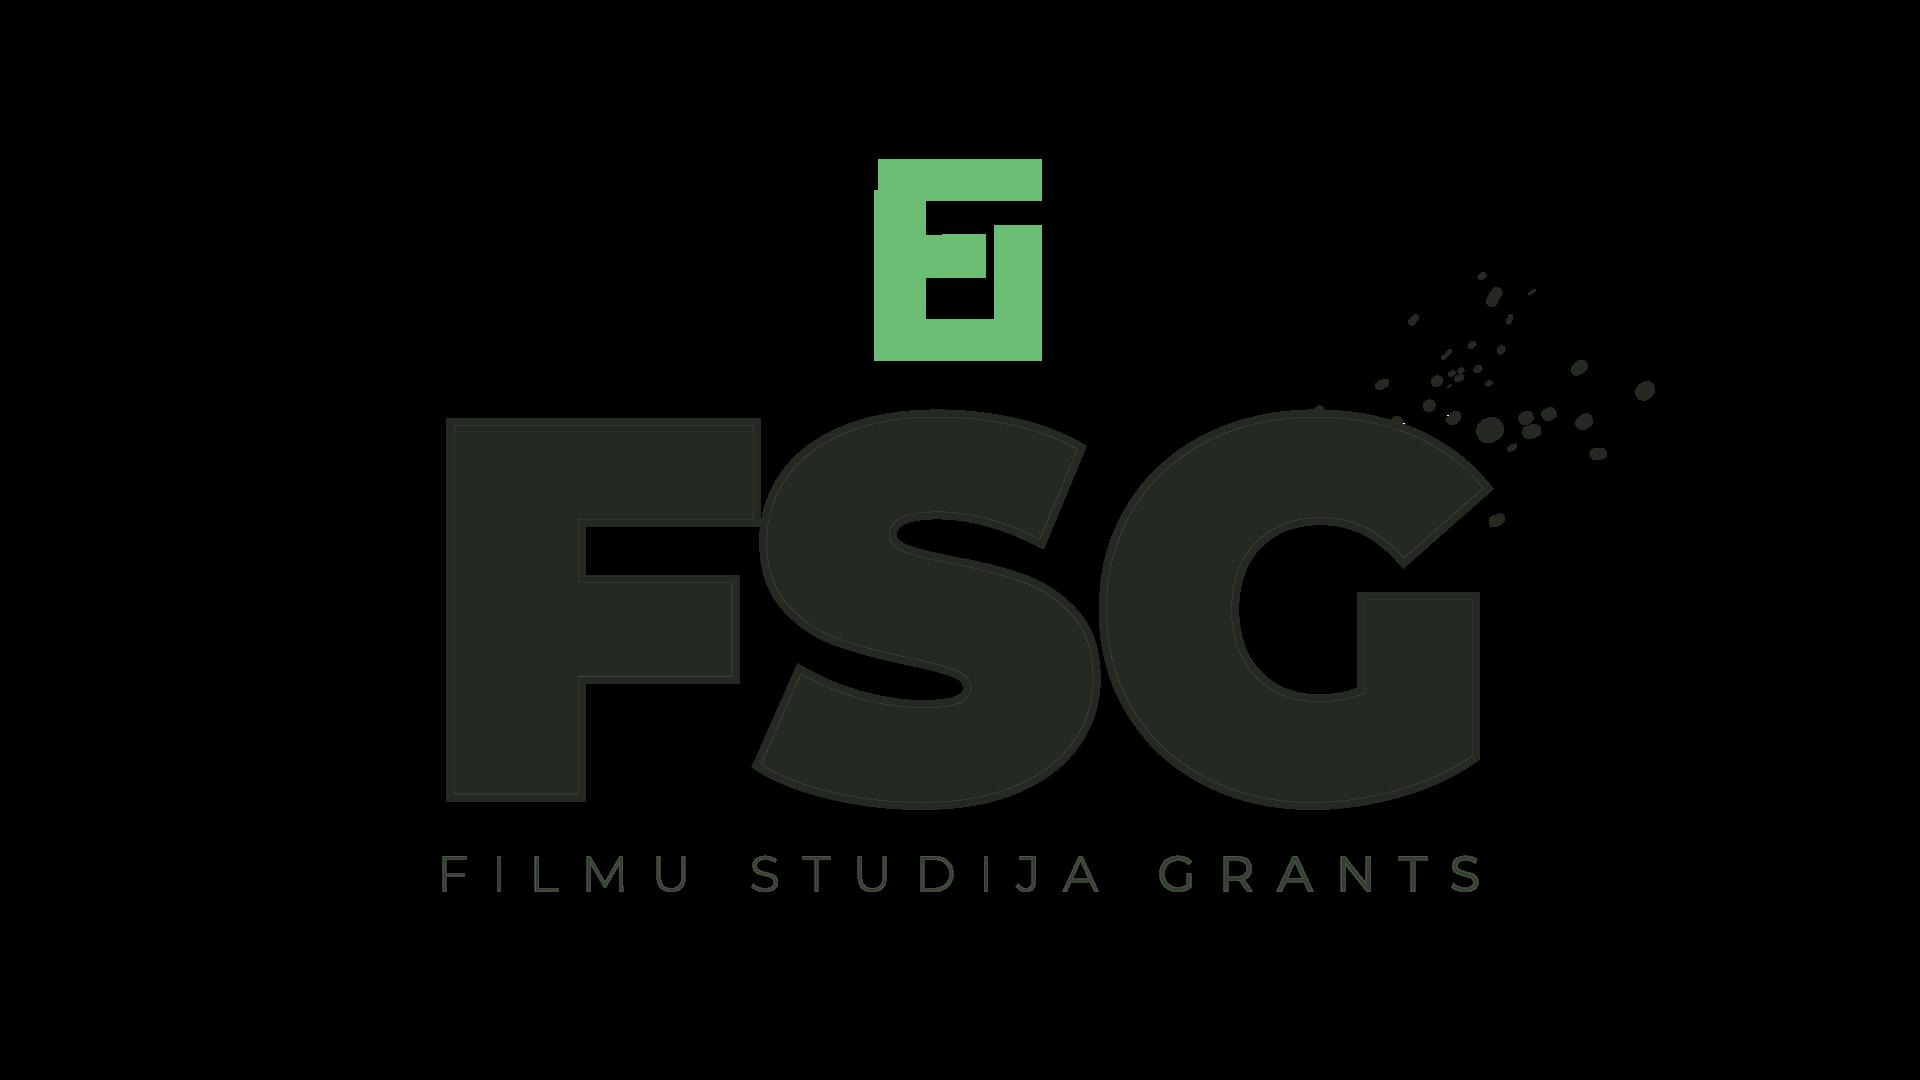 Filmu Studija Grants